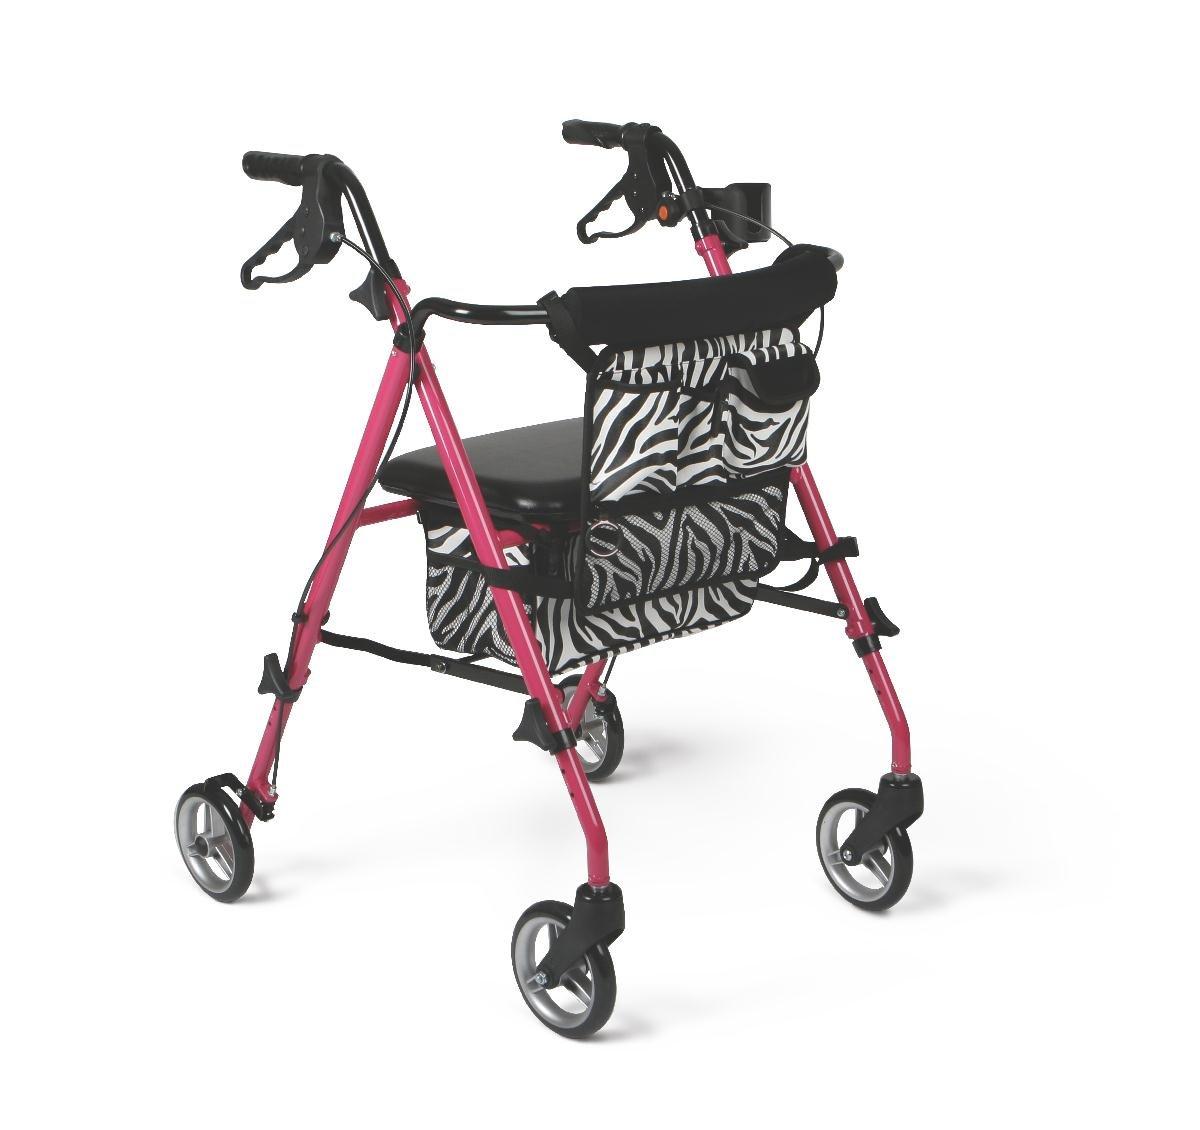 Medline Posh Premium Lightweight Folding Aluminum Rollator Walker with 6'' Wheels, Pink